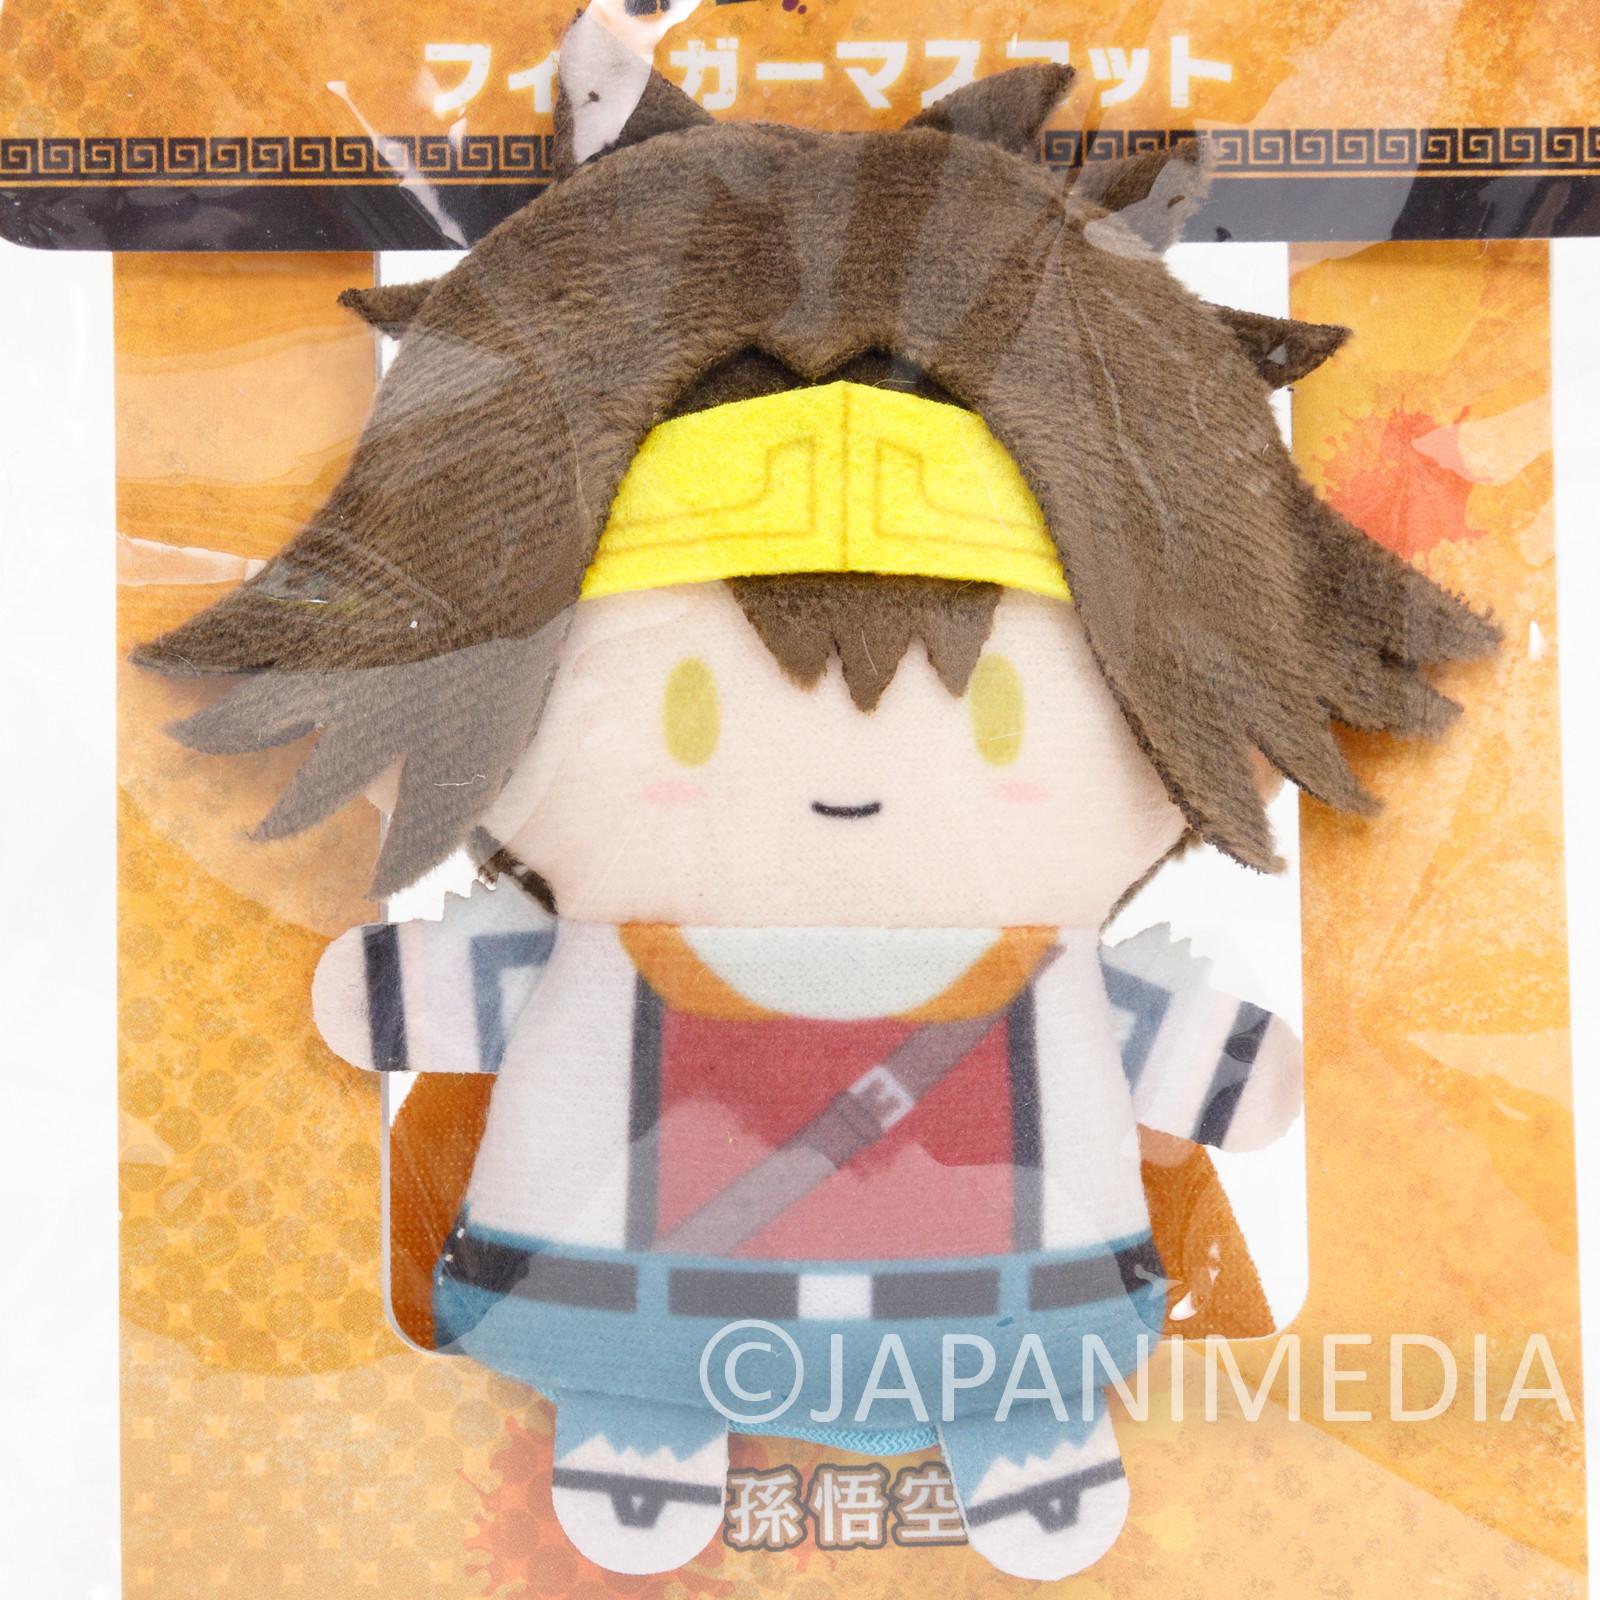 SAIYUKI Reload Blast Son Goku Finger Mascot Puppet Doll PUPPELA Kazuya Minekura